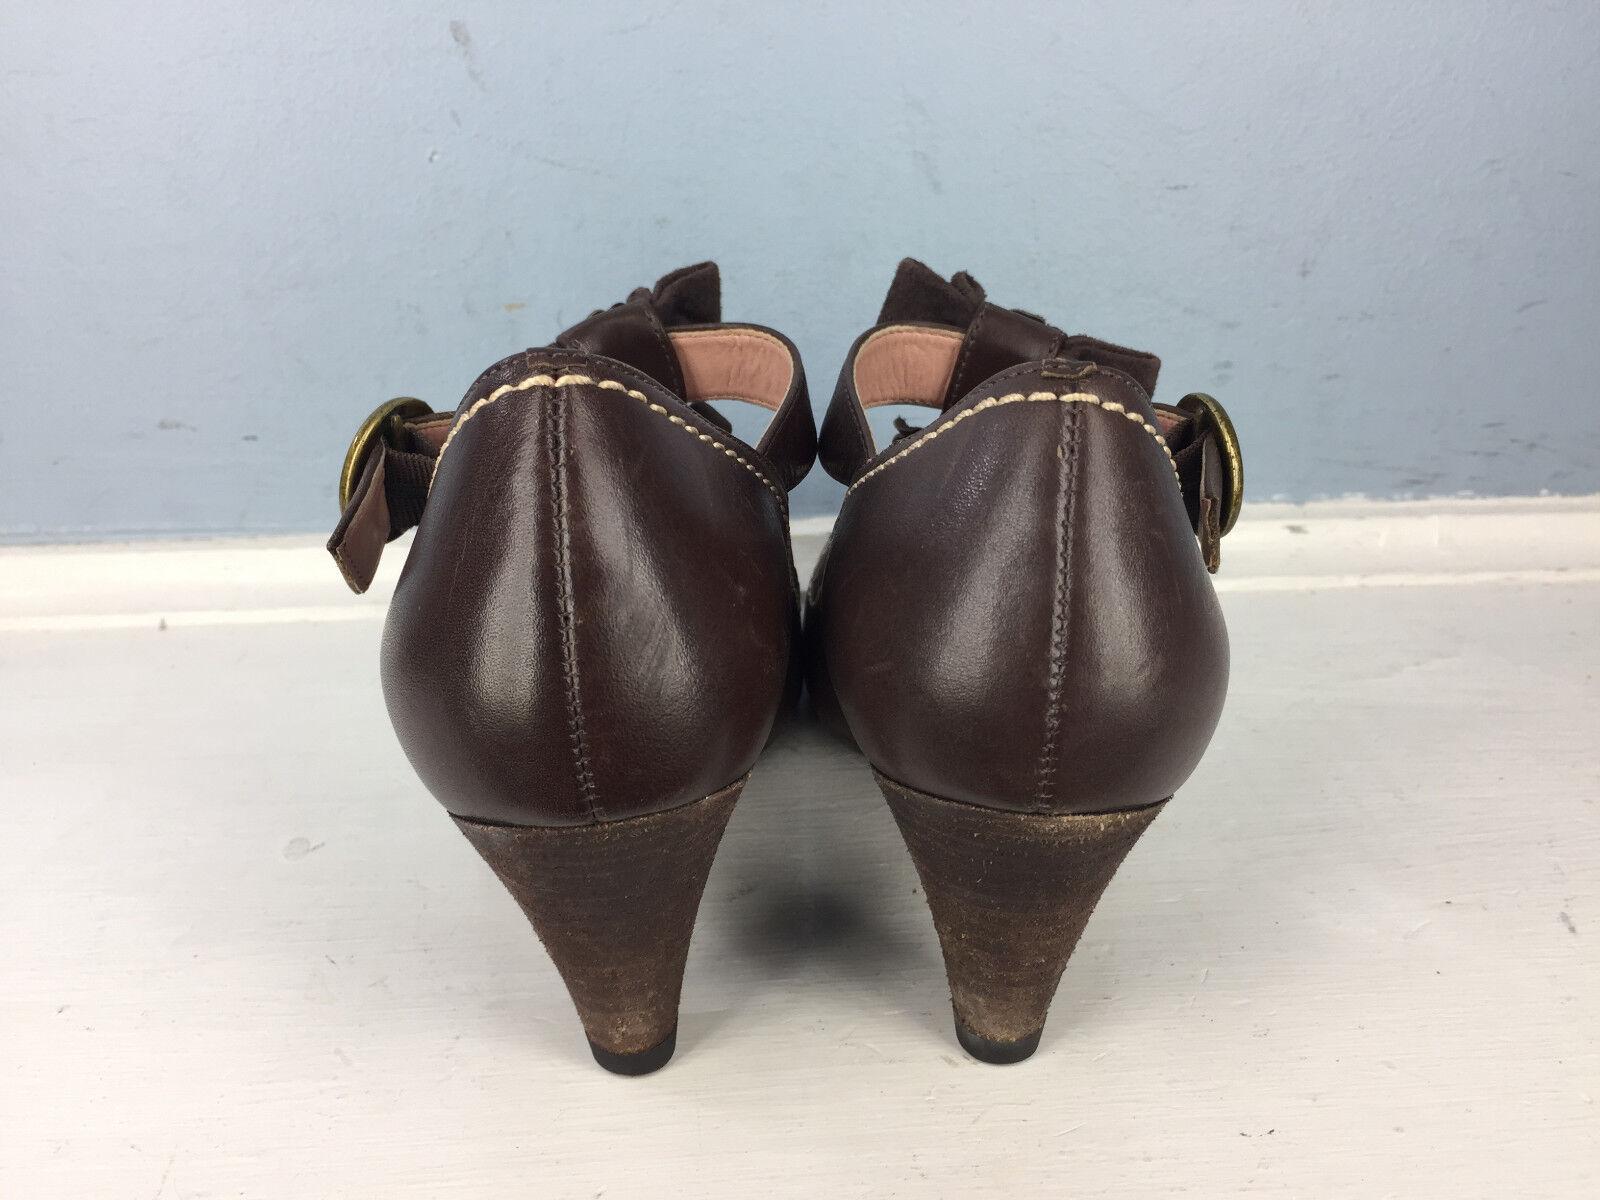 Anthropologie Miss Albright Rensselaer Größe T-Strap Braun Leder Heels Größe Rensselaer 36 5.5 6 0fa437